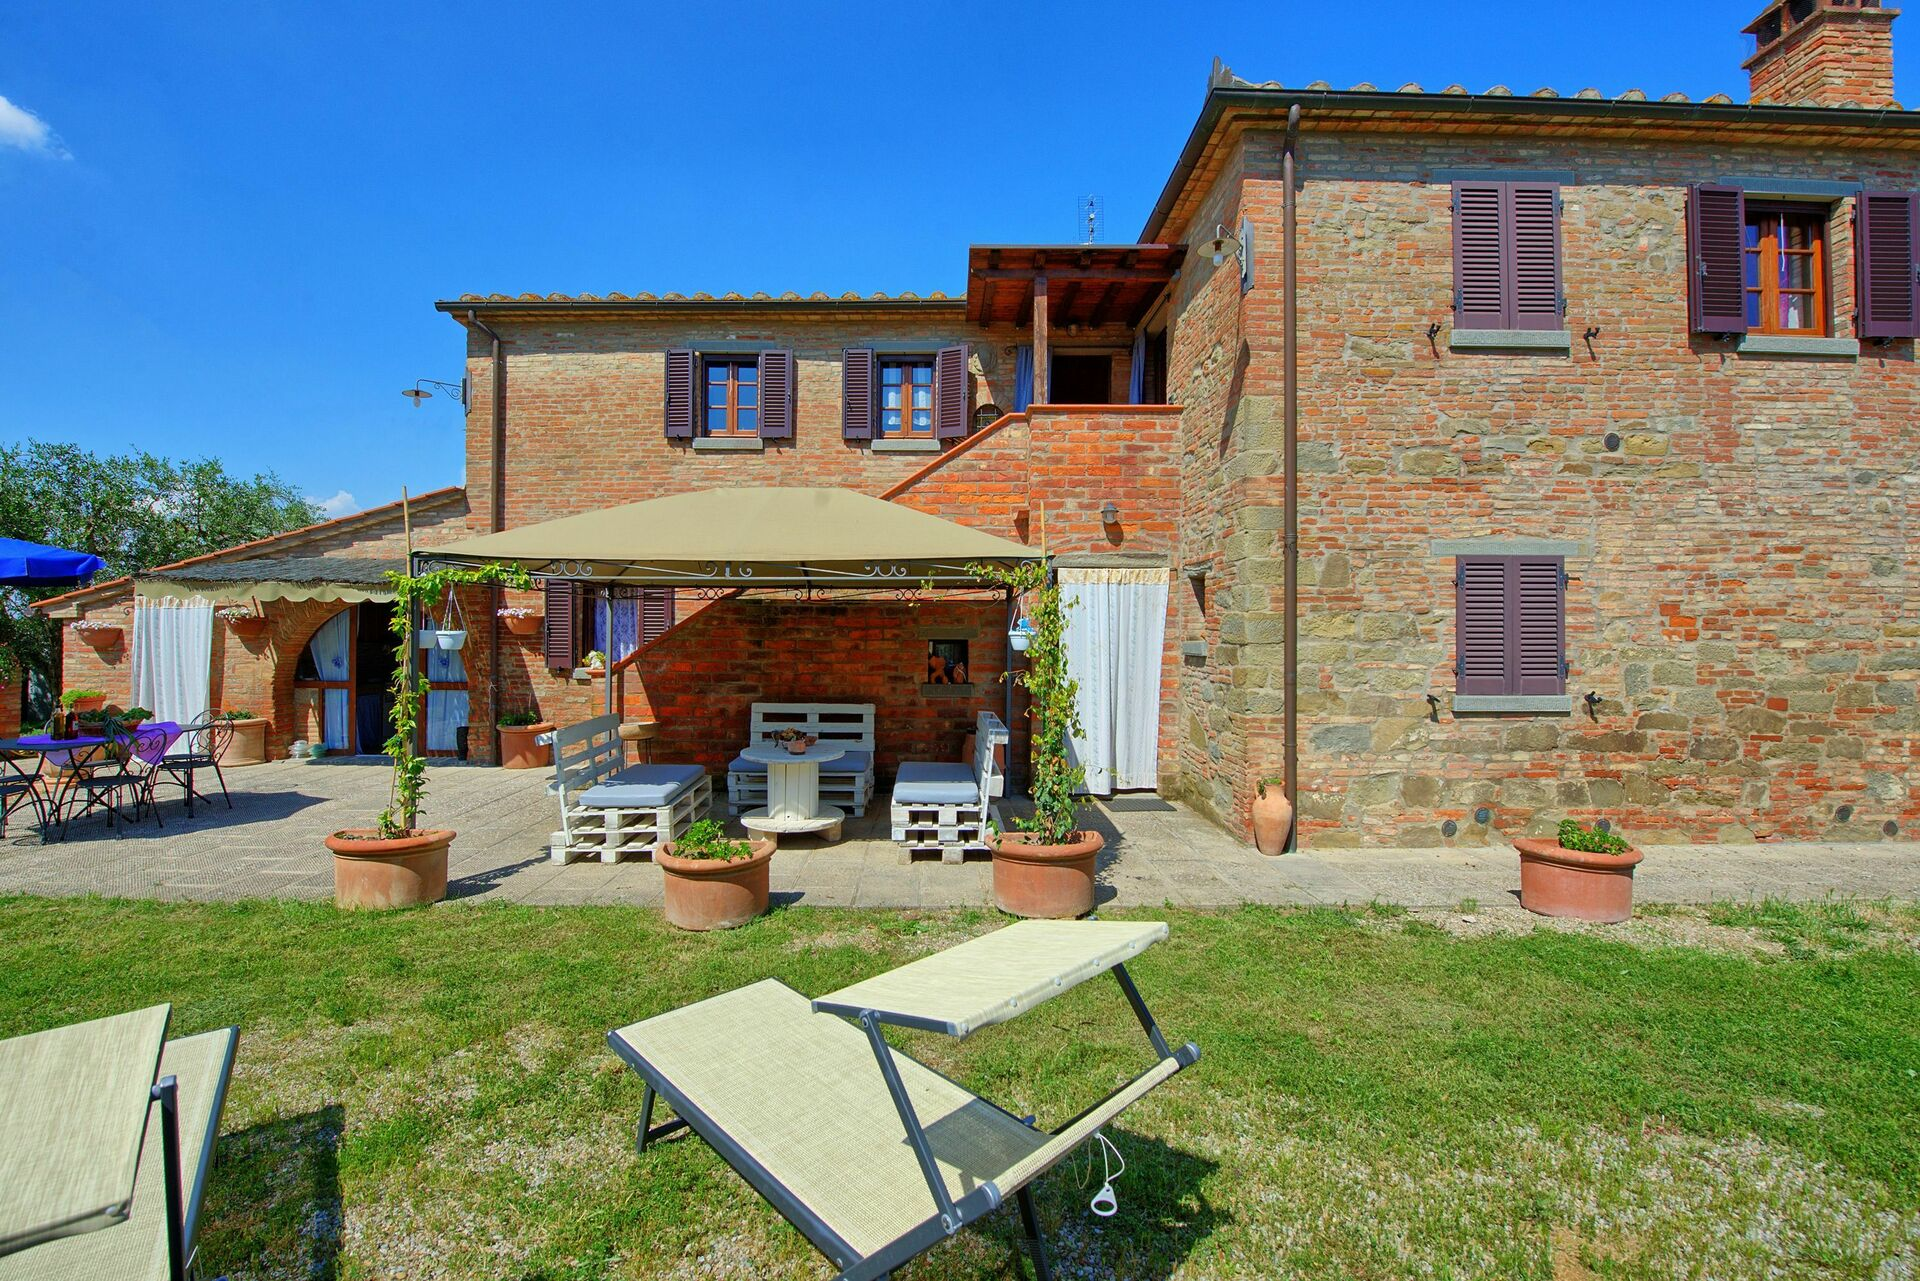 Casale Miro, Ferienhaus in Fratticciola Toskana - 12 ...